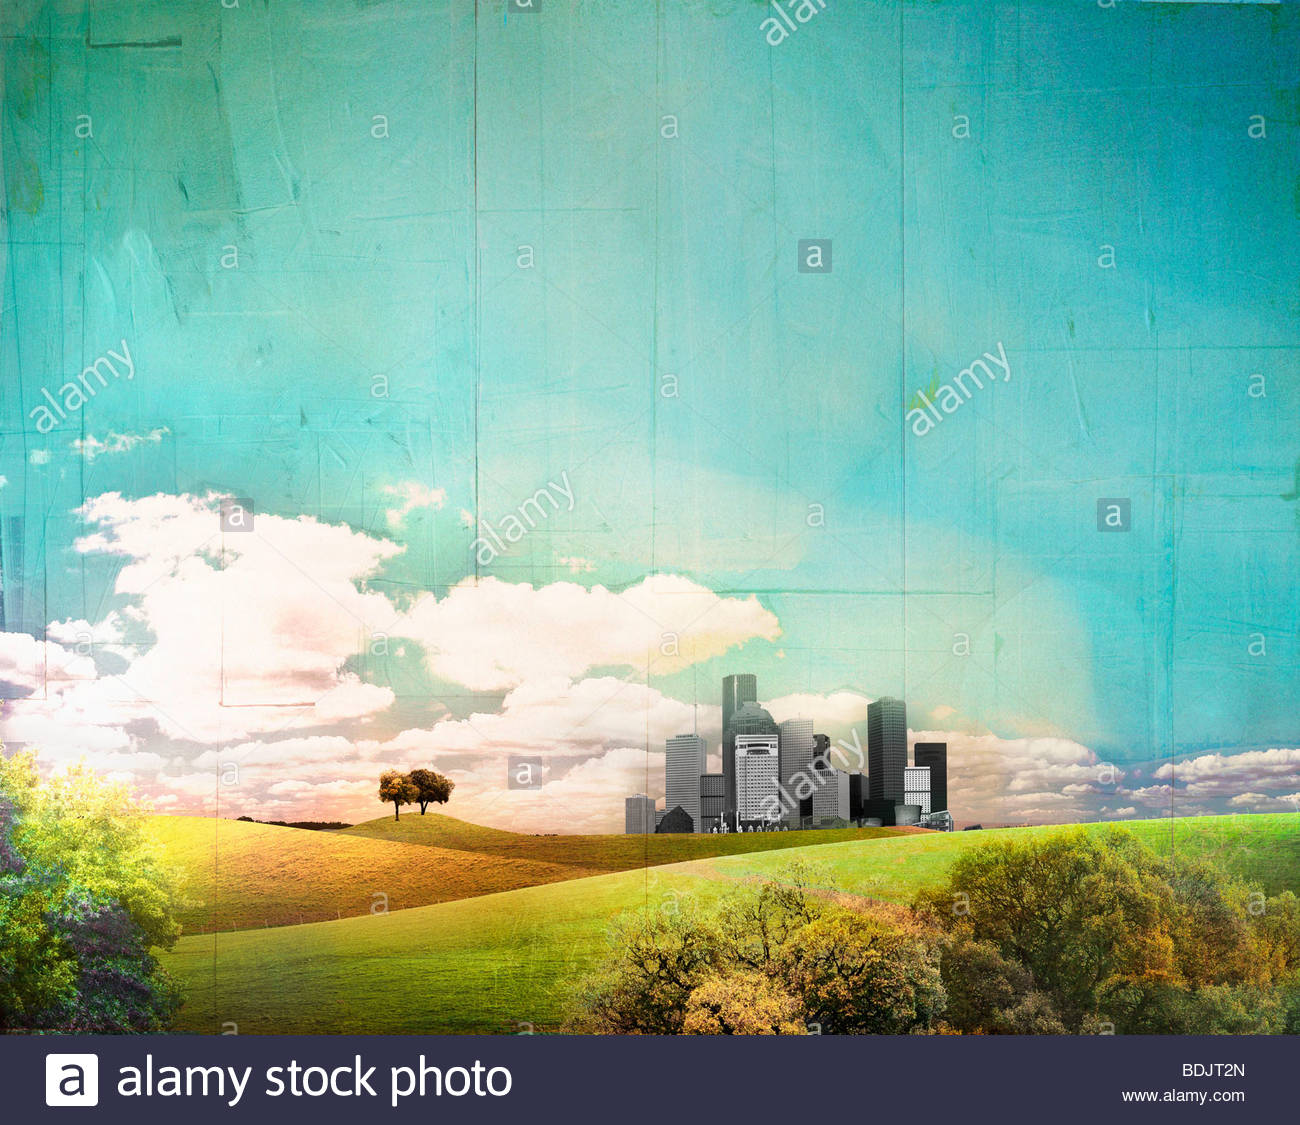 Fernen Stadtbild hinter Landschaft Stockbild